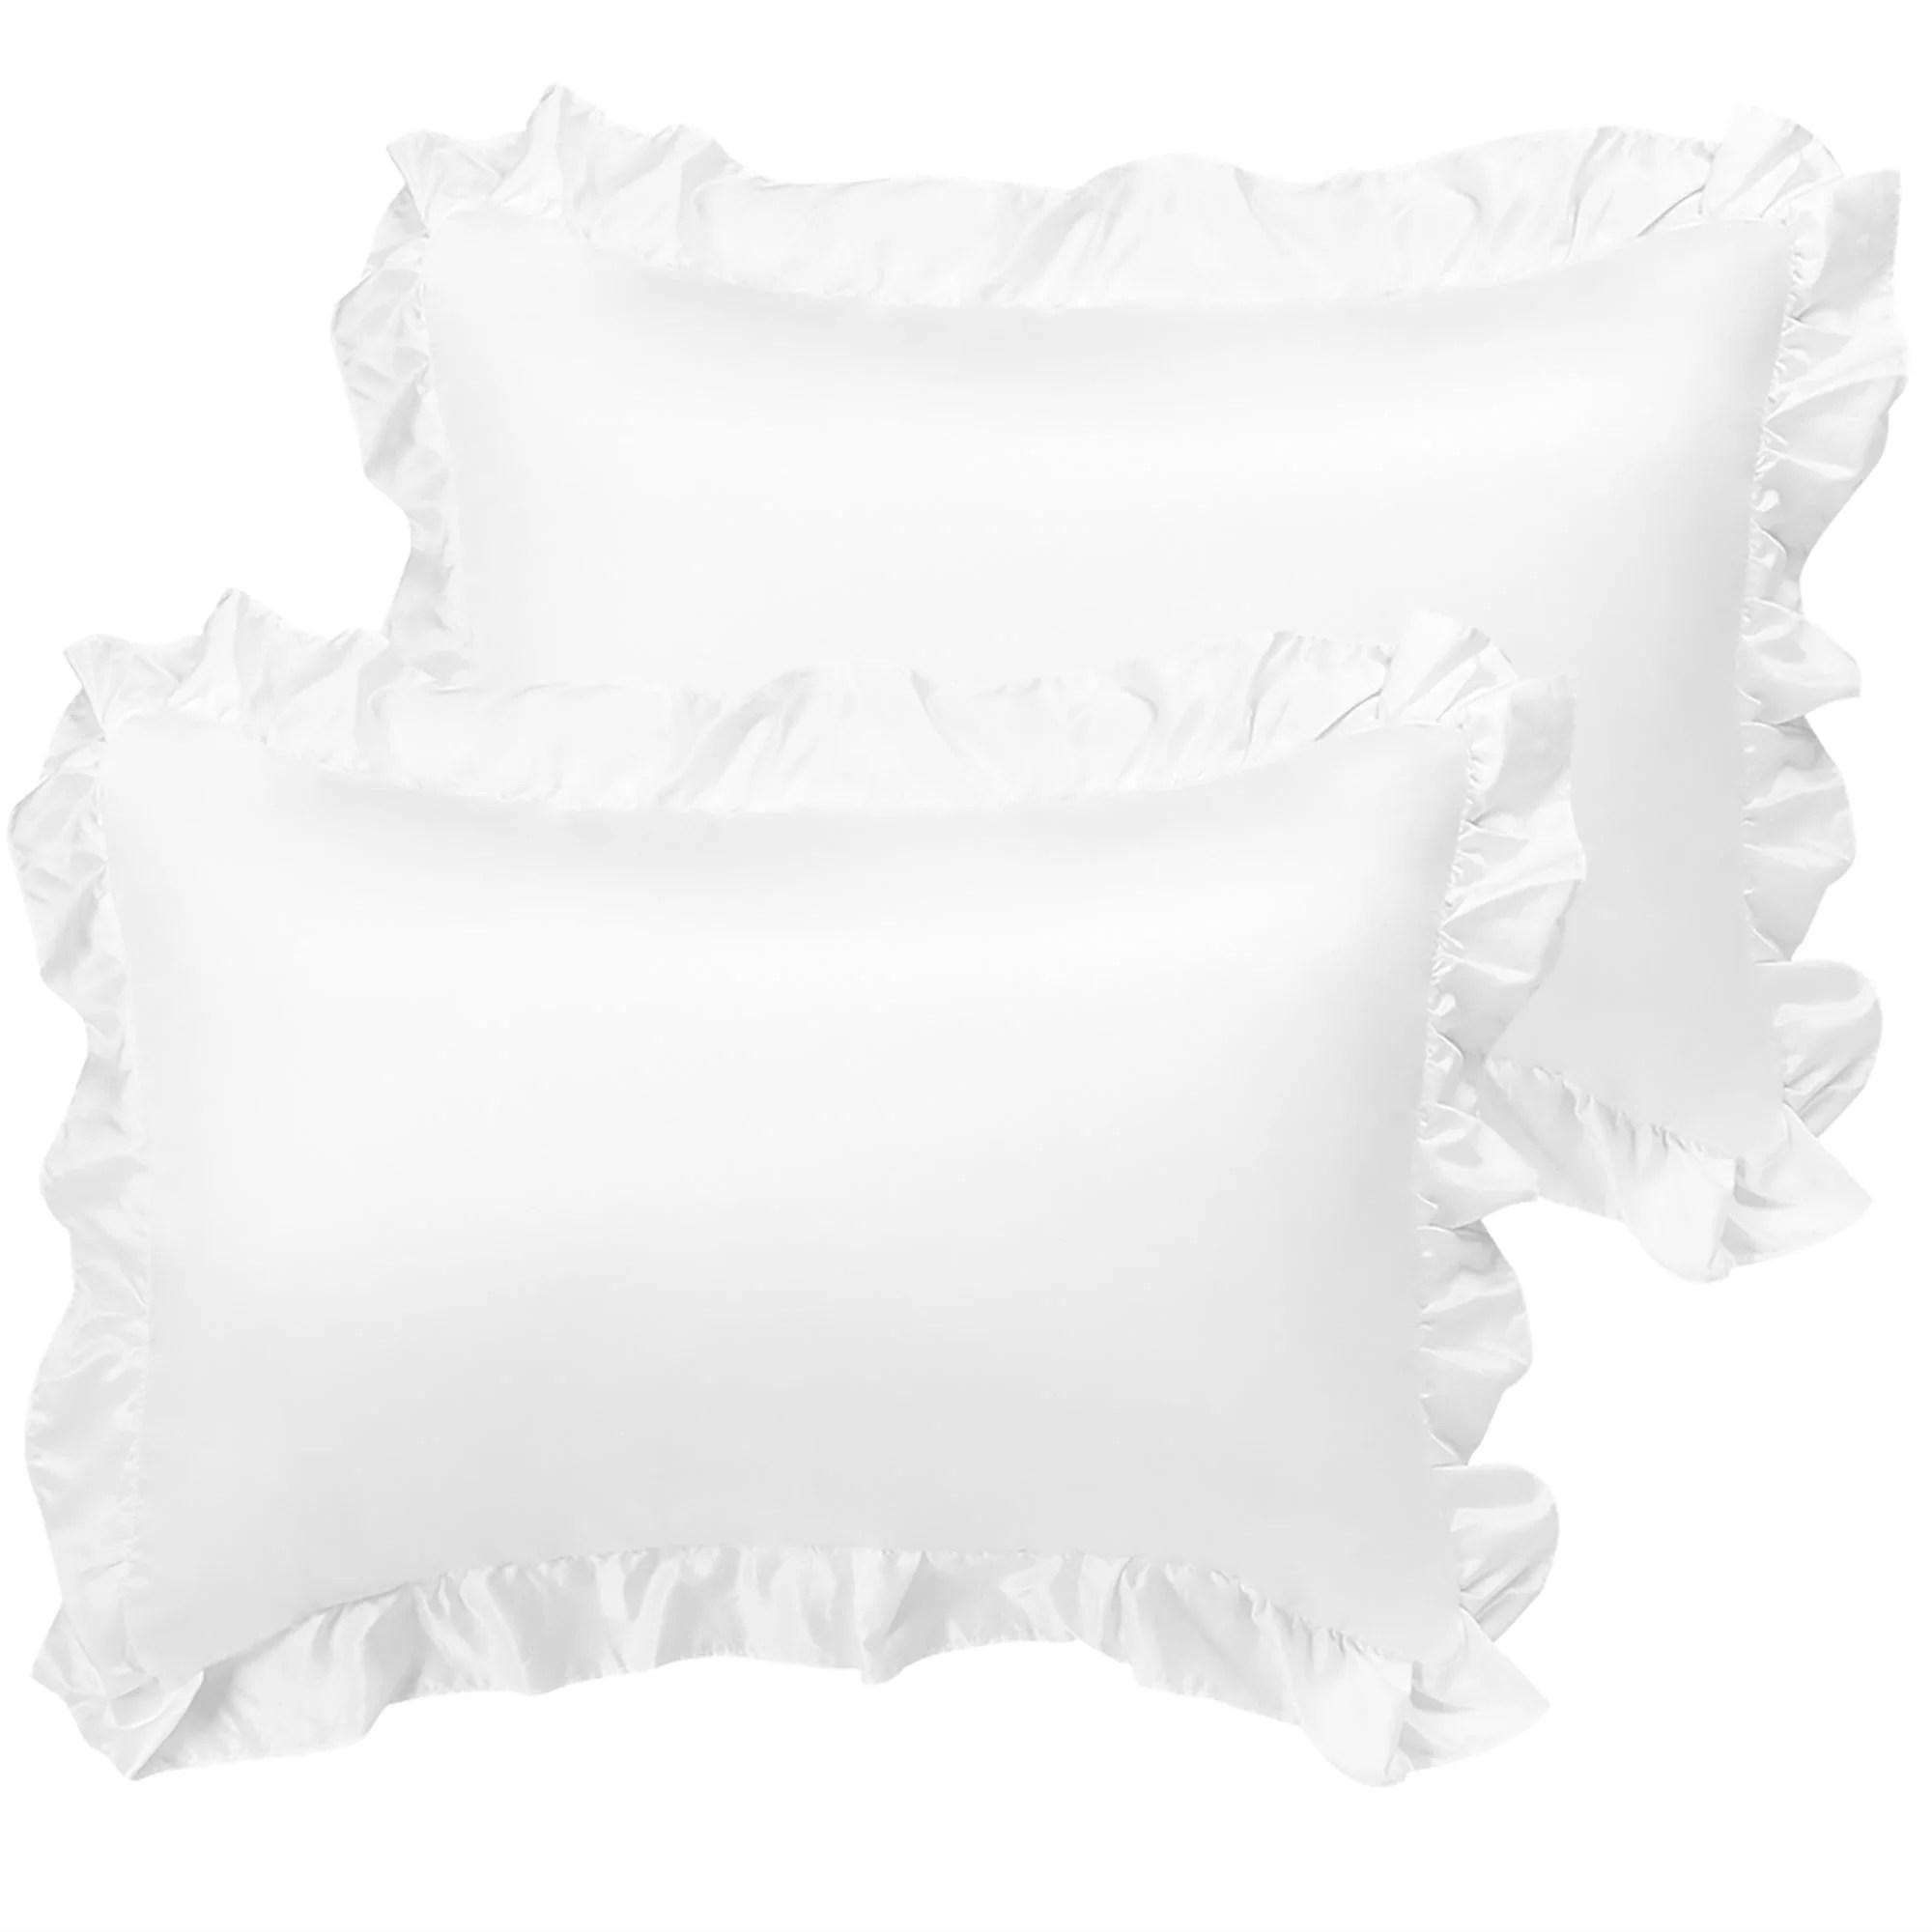 satin pillowcase king ruffled pillow shams set of 2 silky sateen pillow cases covers